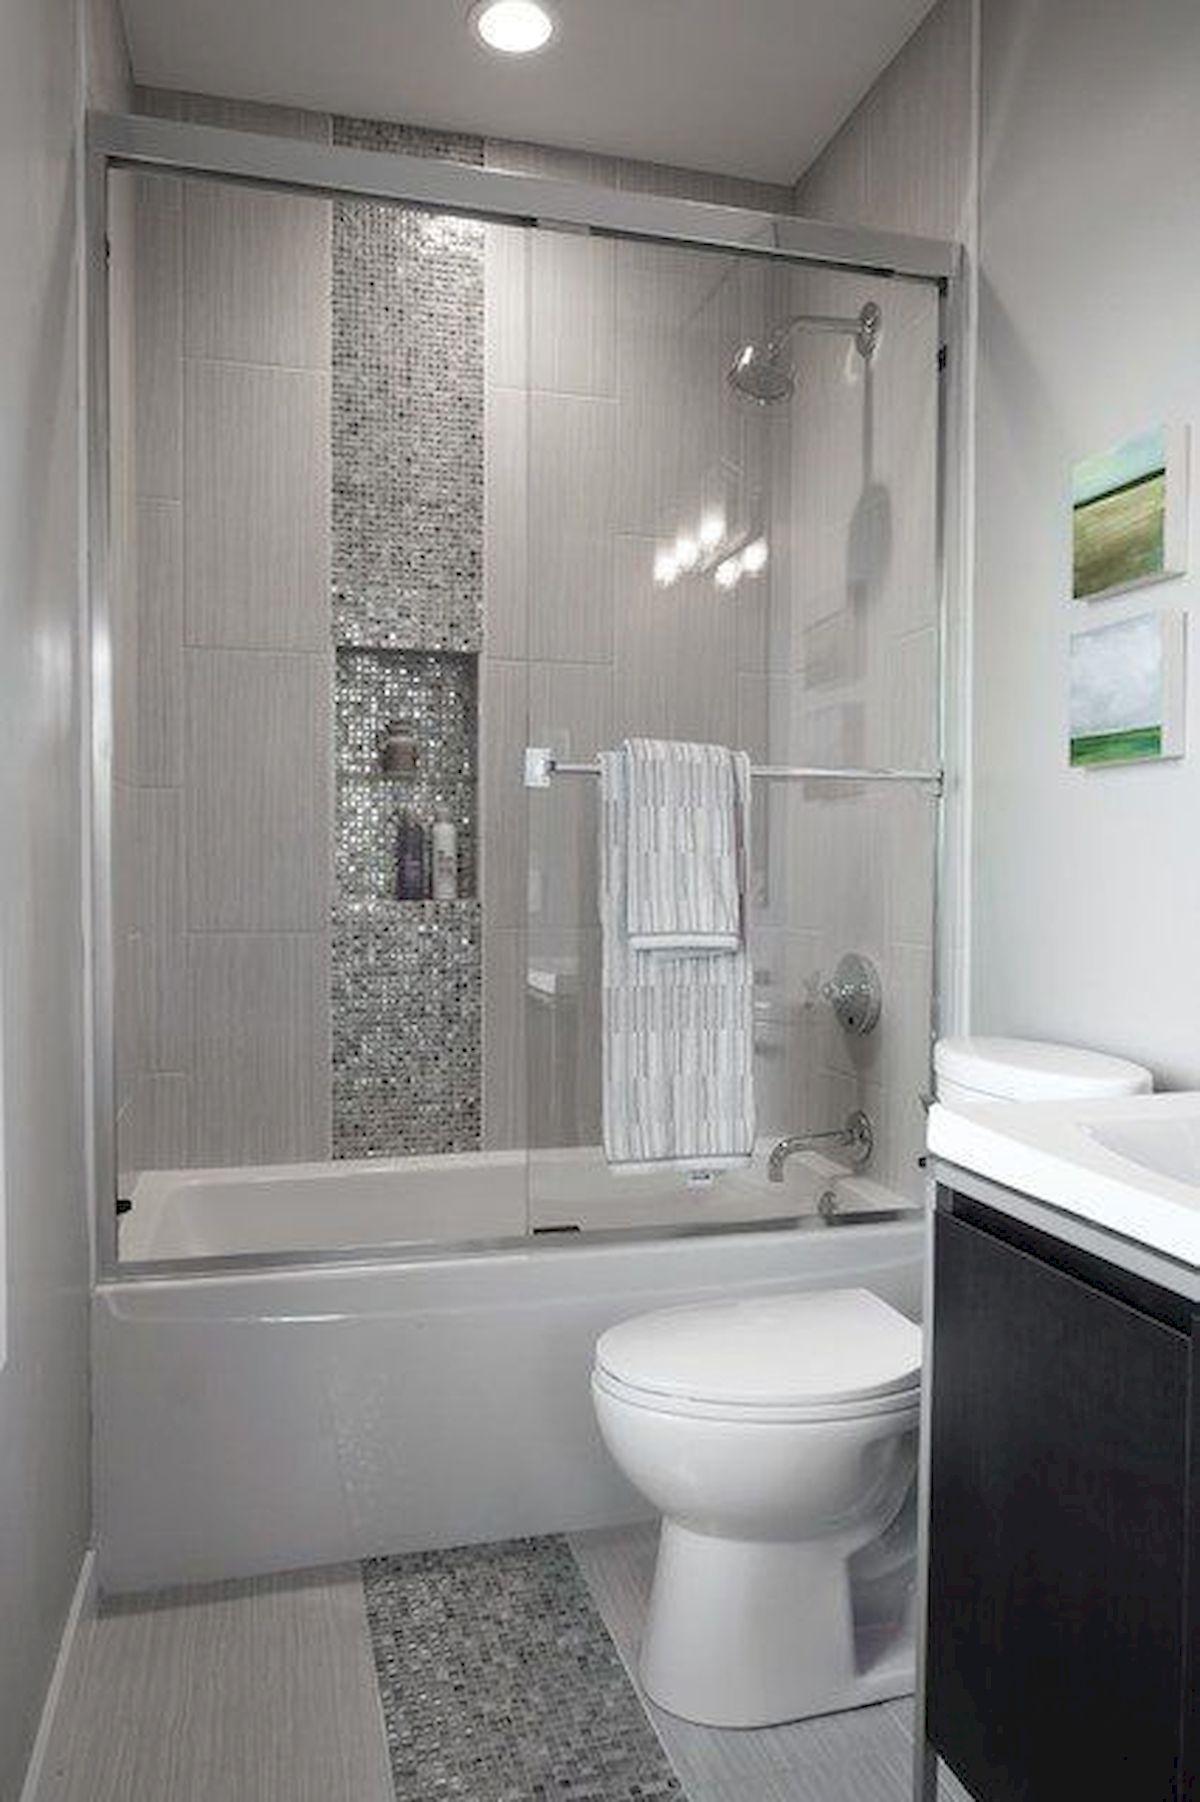 60 Elegant Small Master Bathroom Remodel Ideas (20 in 2019 ...